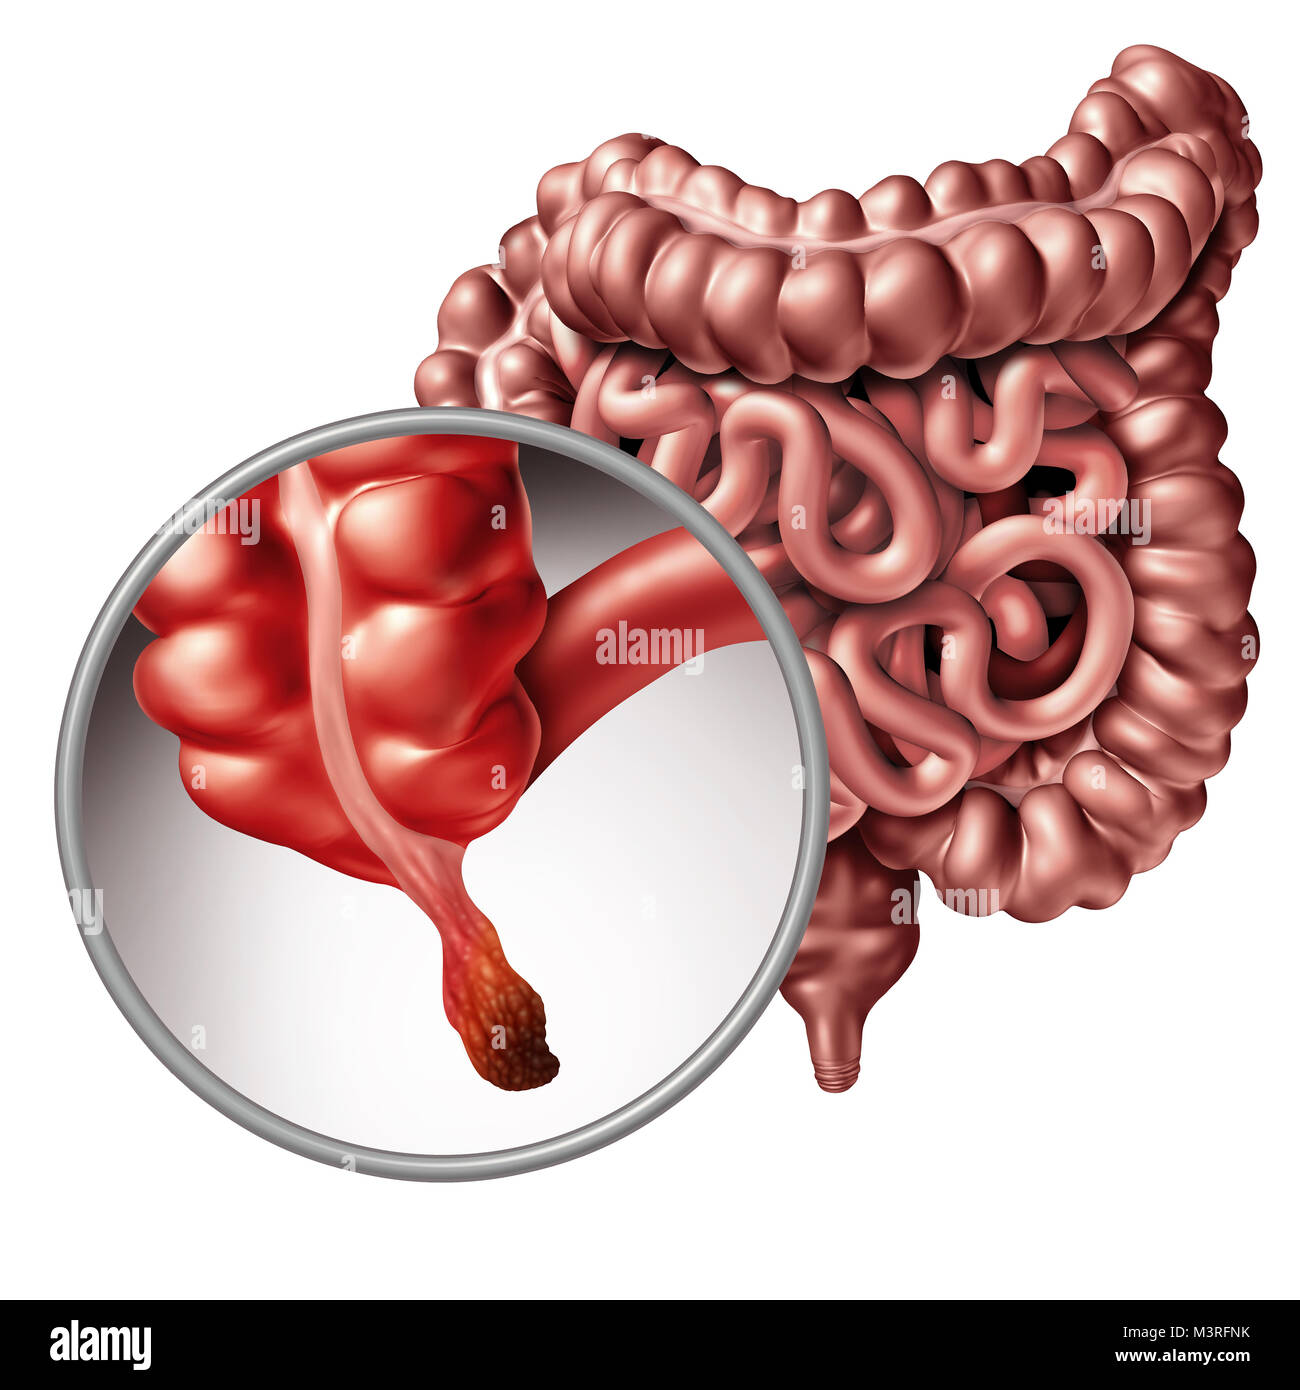 Blinddarmentzündung und Anhang Entzündung Krankheit Konzept als ...